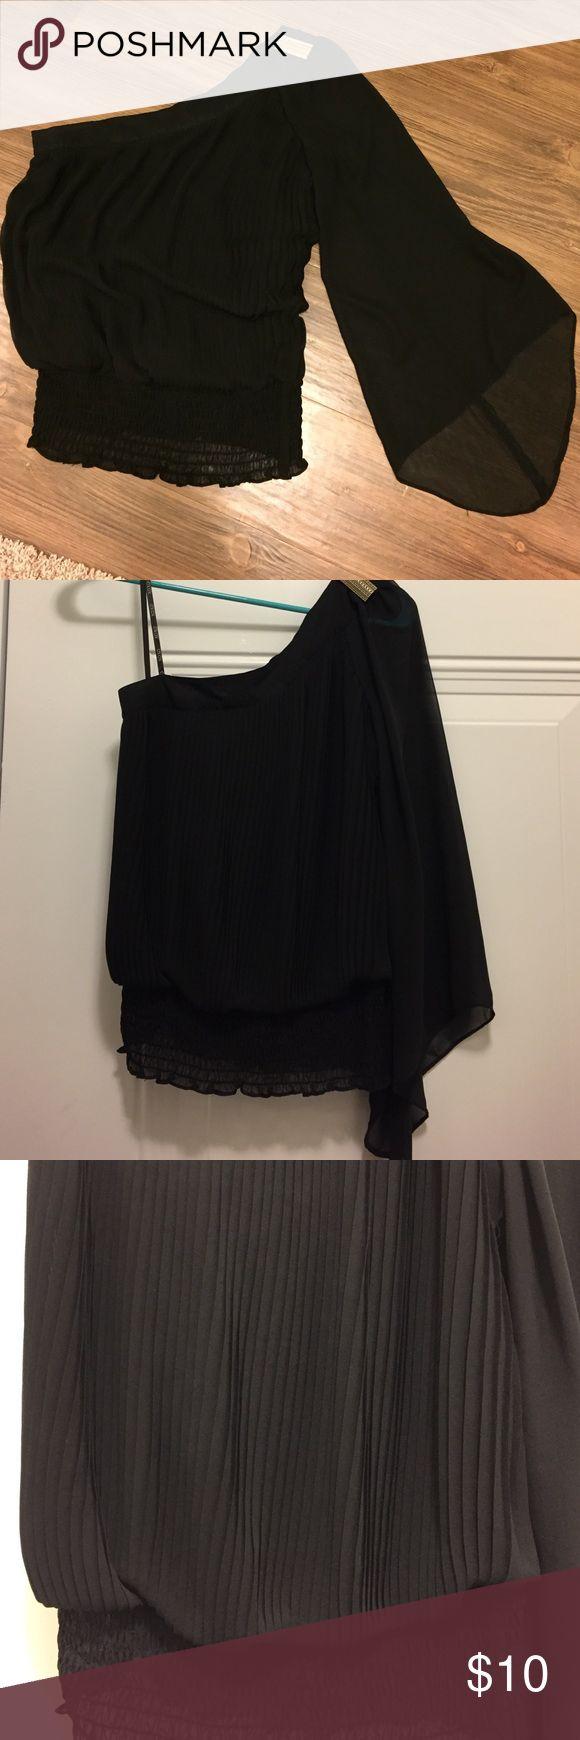 Xoxo one shoulder chiffon blouse. Size M Xoxo black one shoulder blouse top. Broach on left shoulder. Size M XOXO Tops Blouses